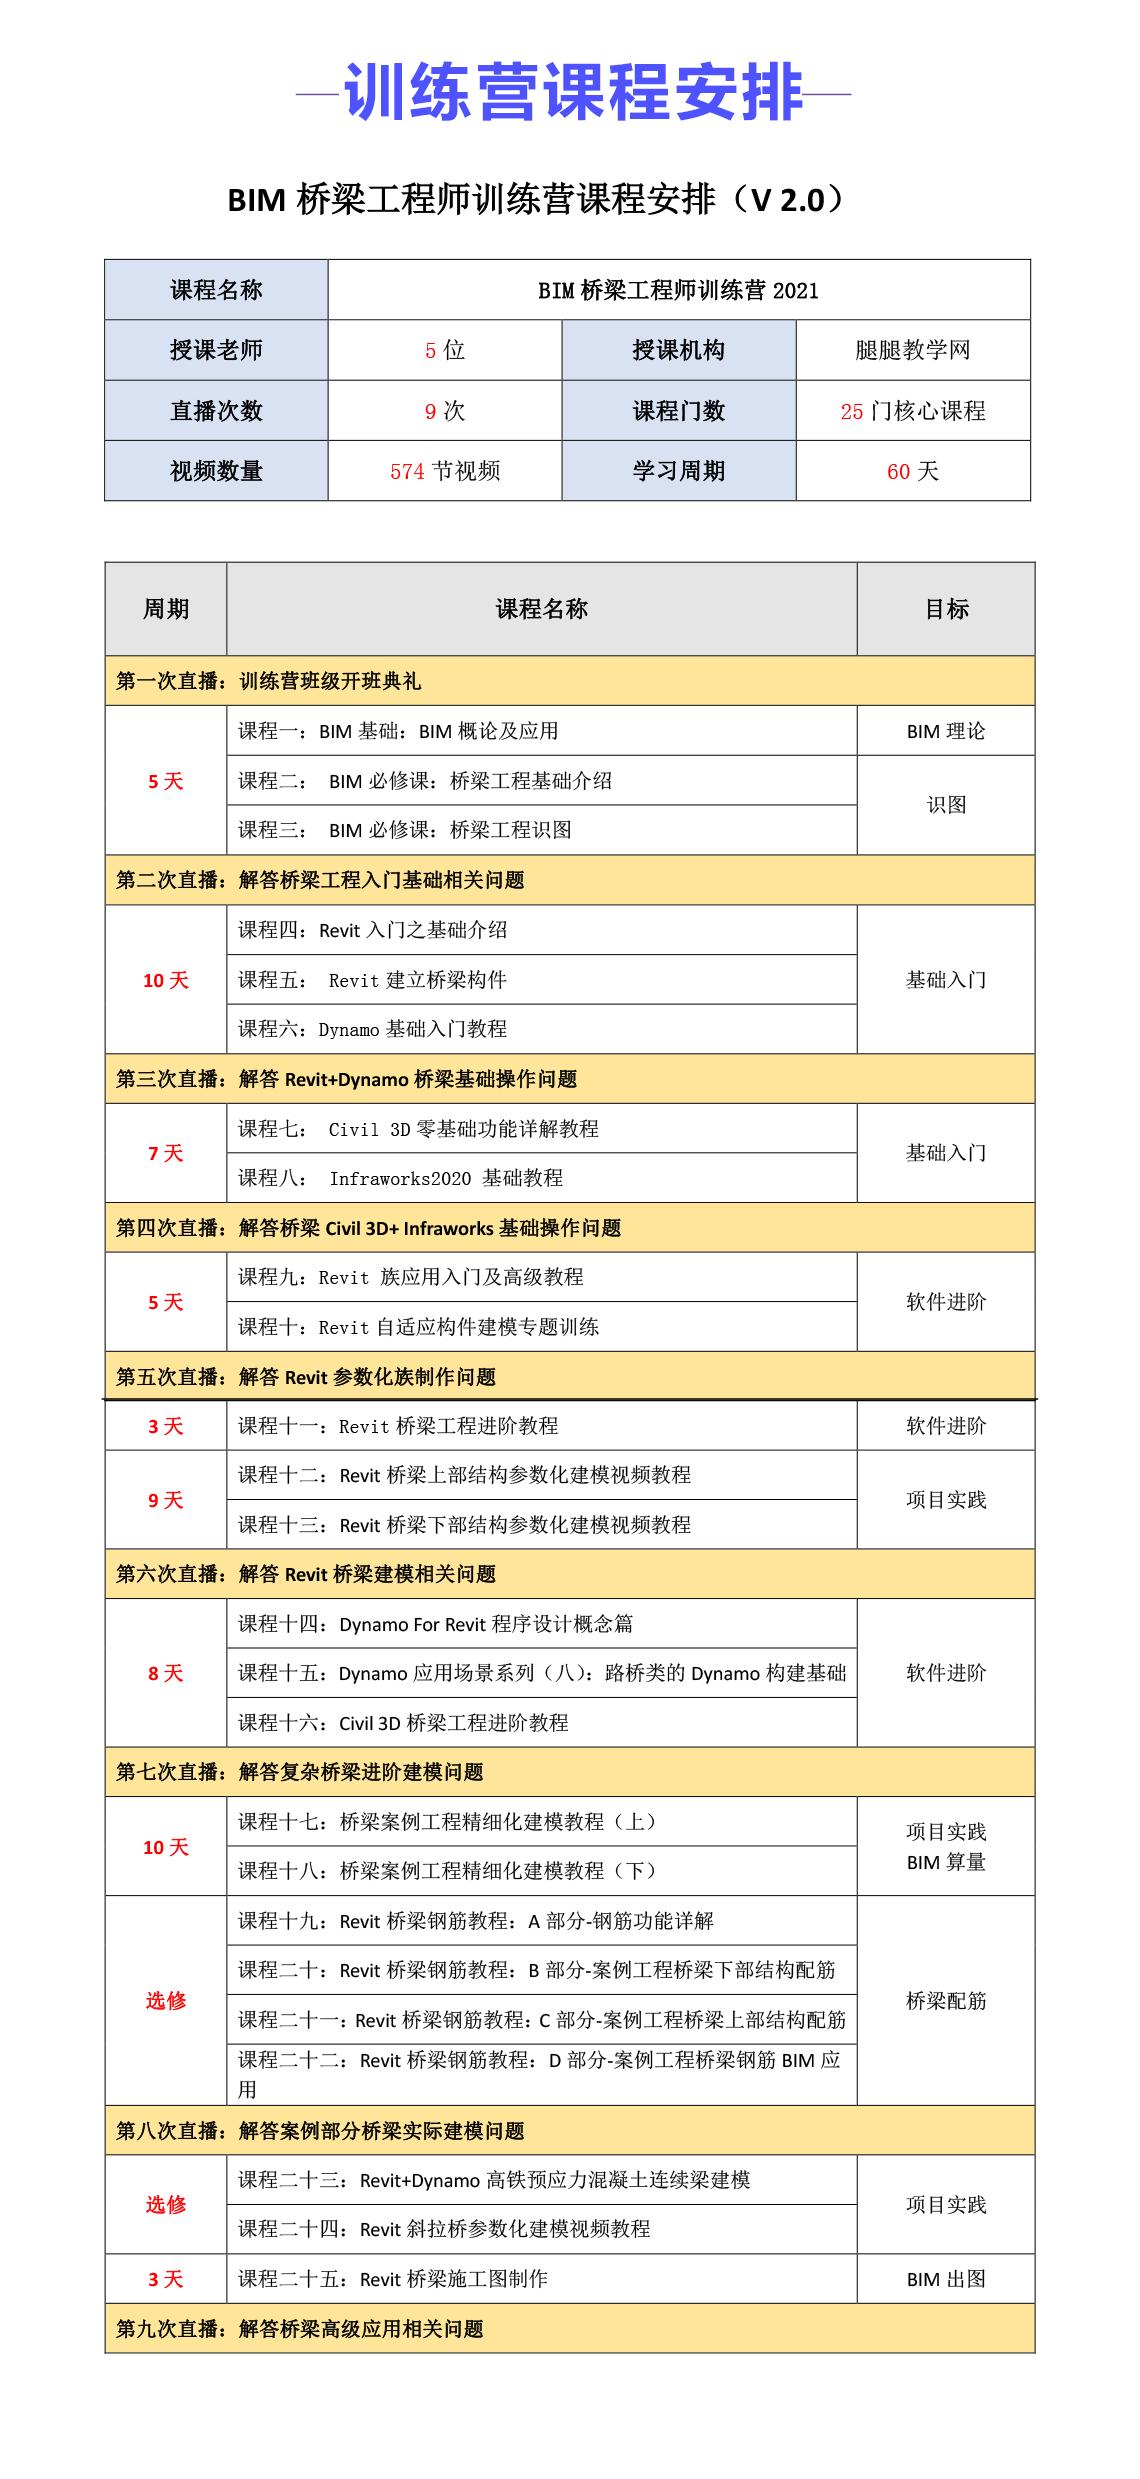 BIM桥梁工程师训练营课时调整.png